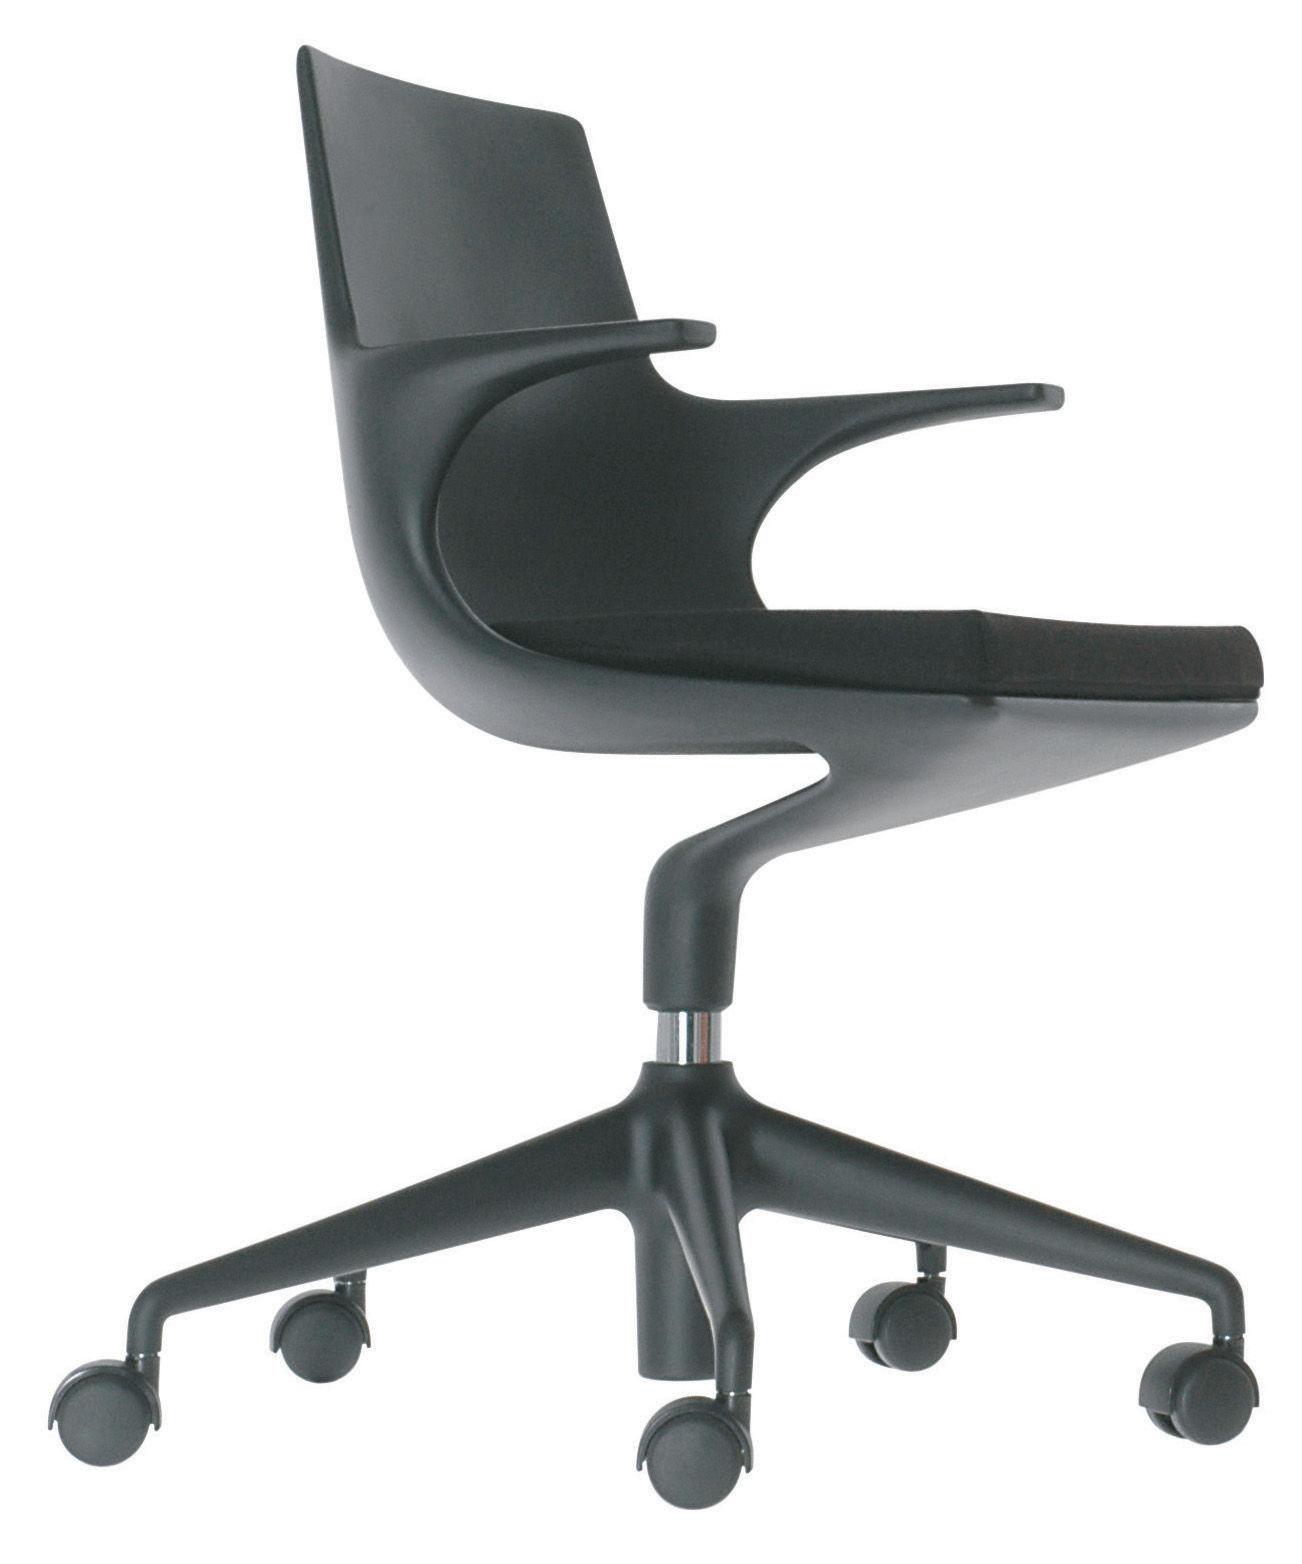 Arredamento - Mobili Ados  - Poltrona a rotelle Spoon Chair di Kartell - Nero / cuscino nero - Polipropilene